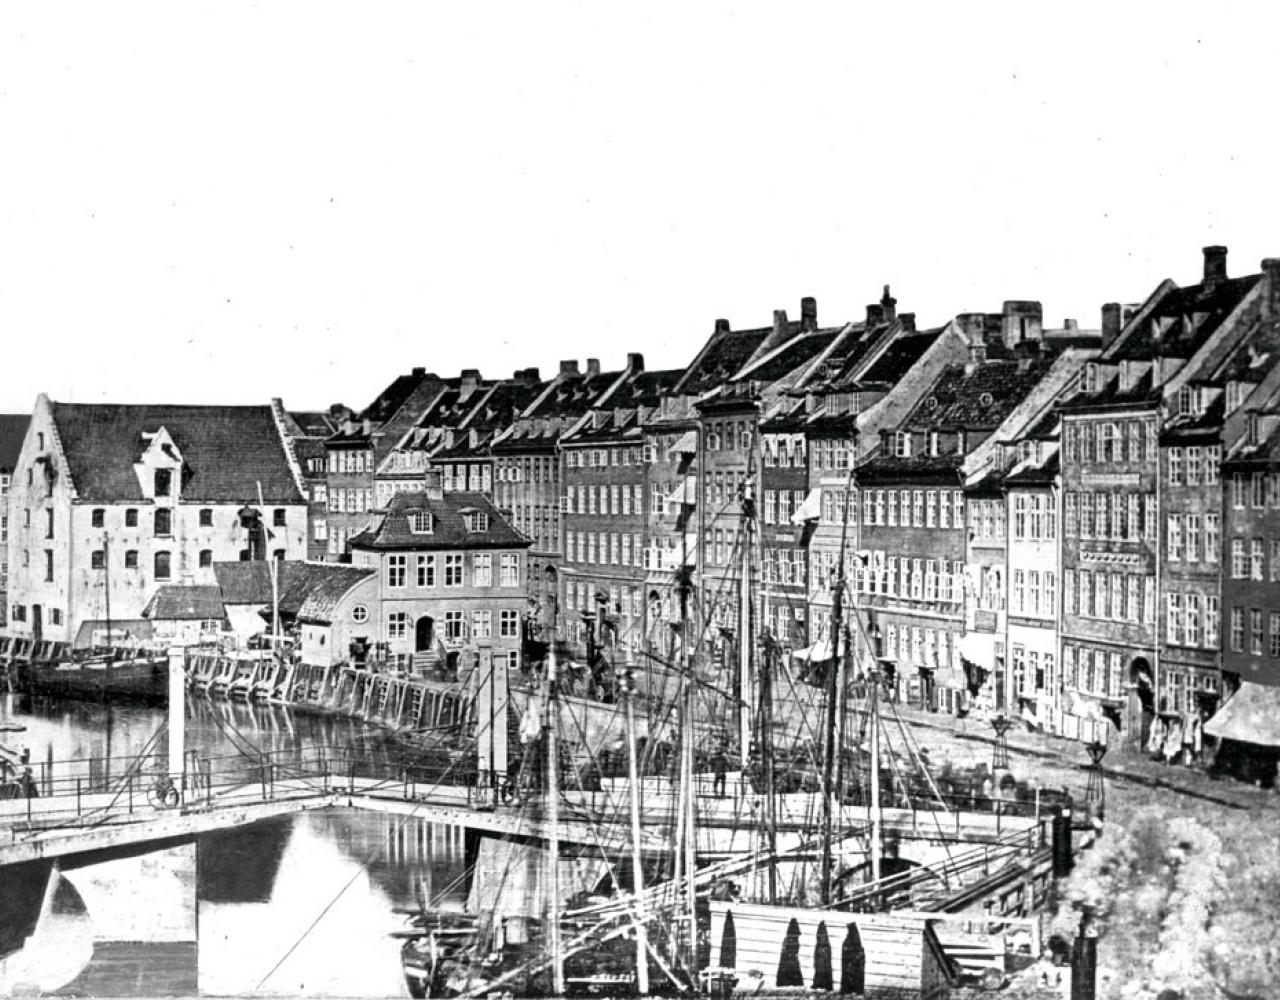 1840 Copenhagen Gammel Strand efter-daguerreotypi